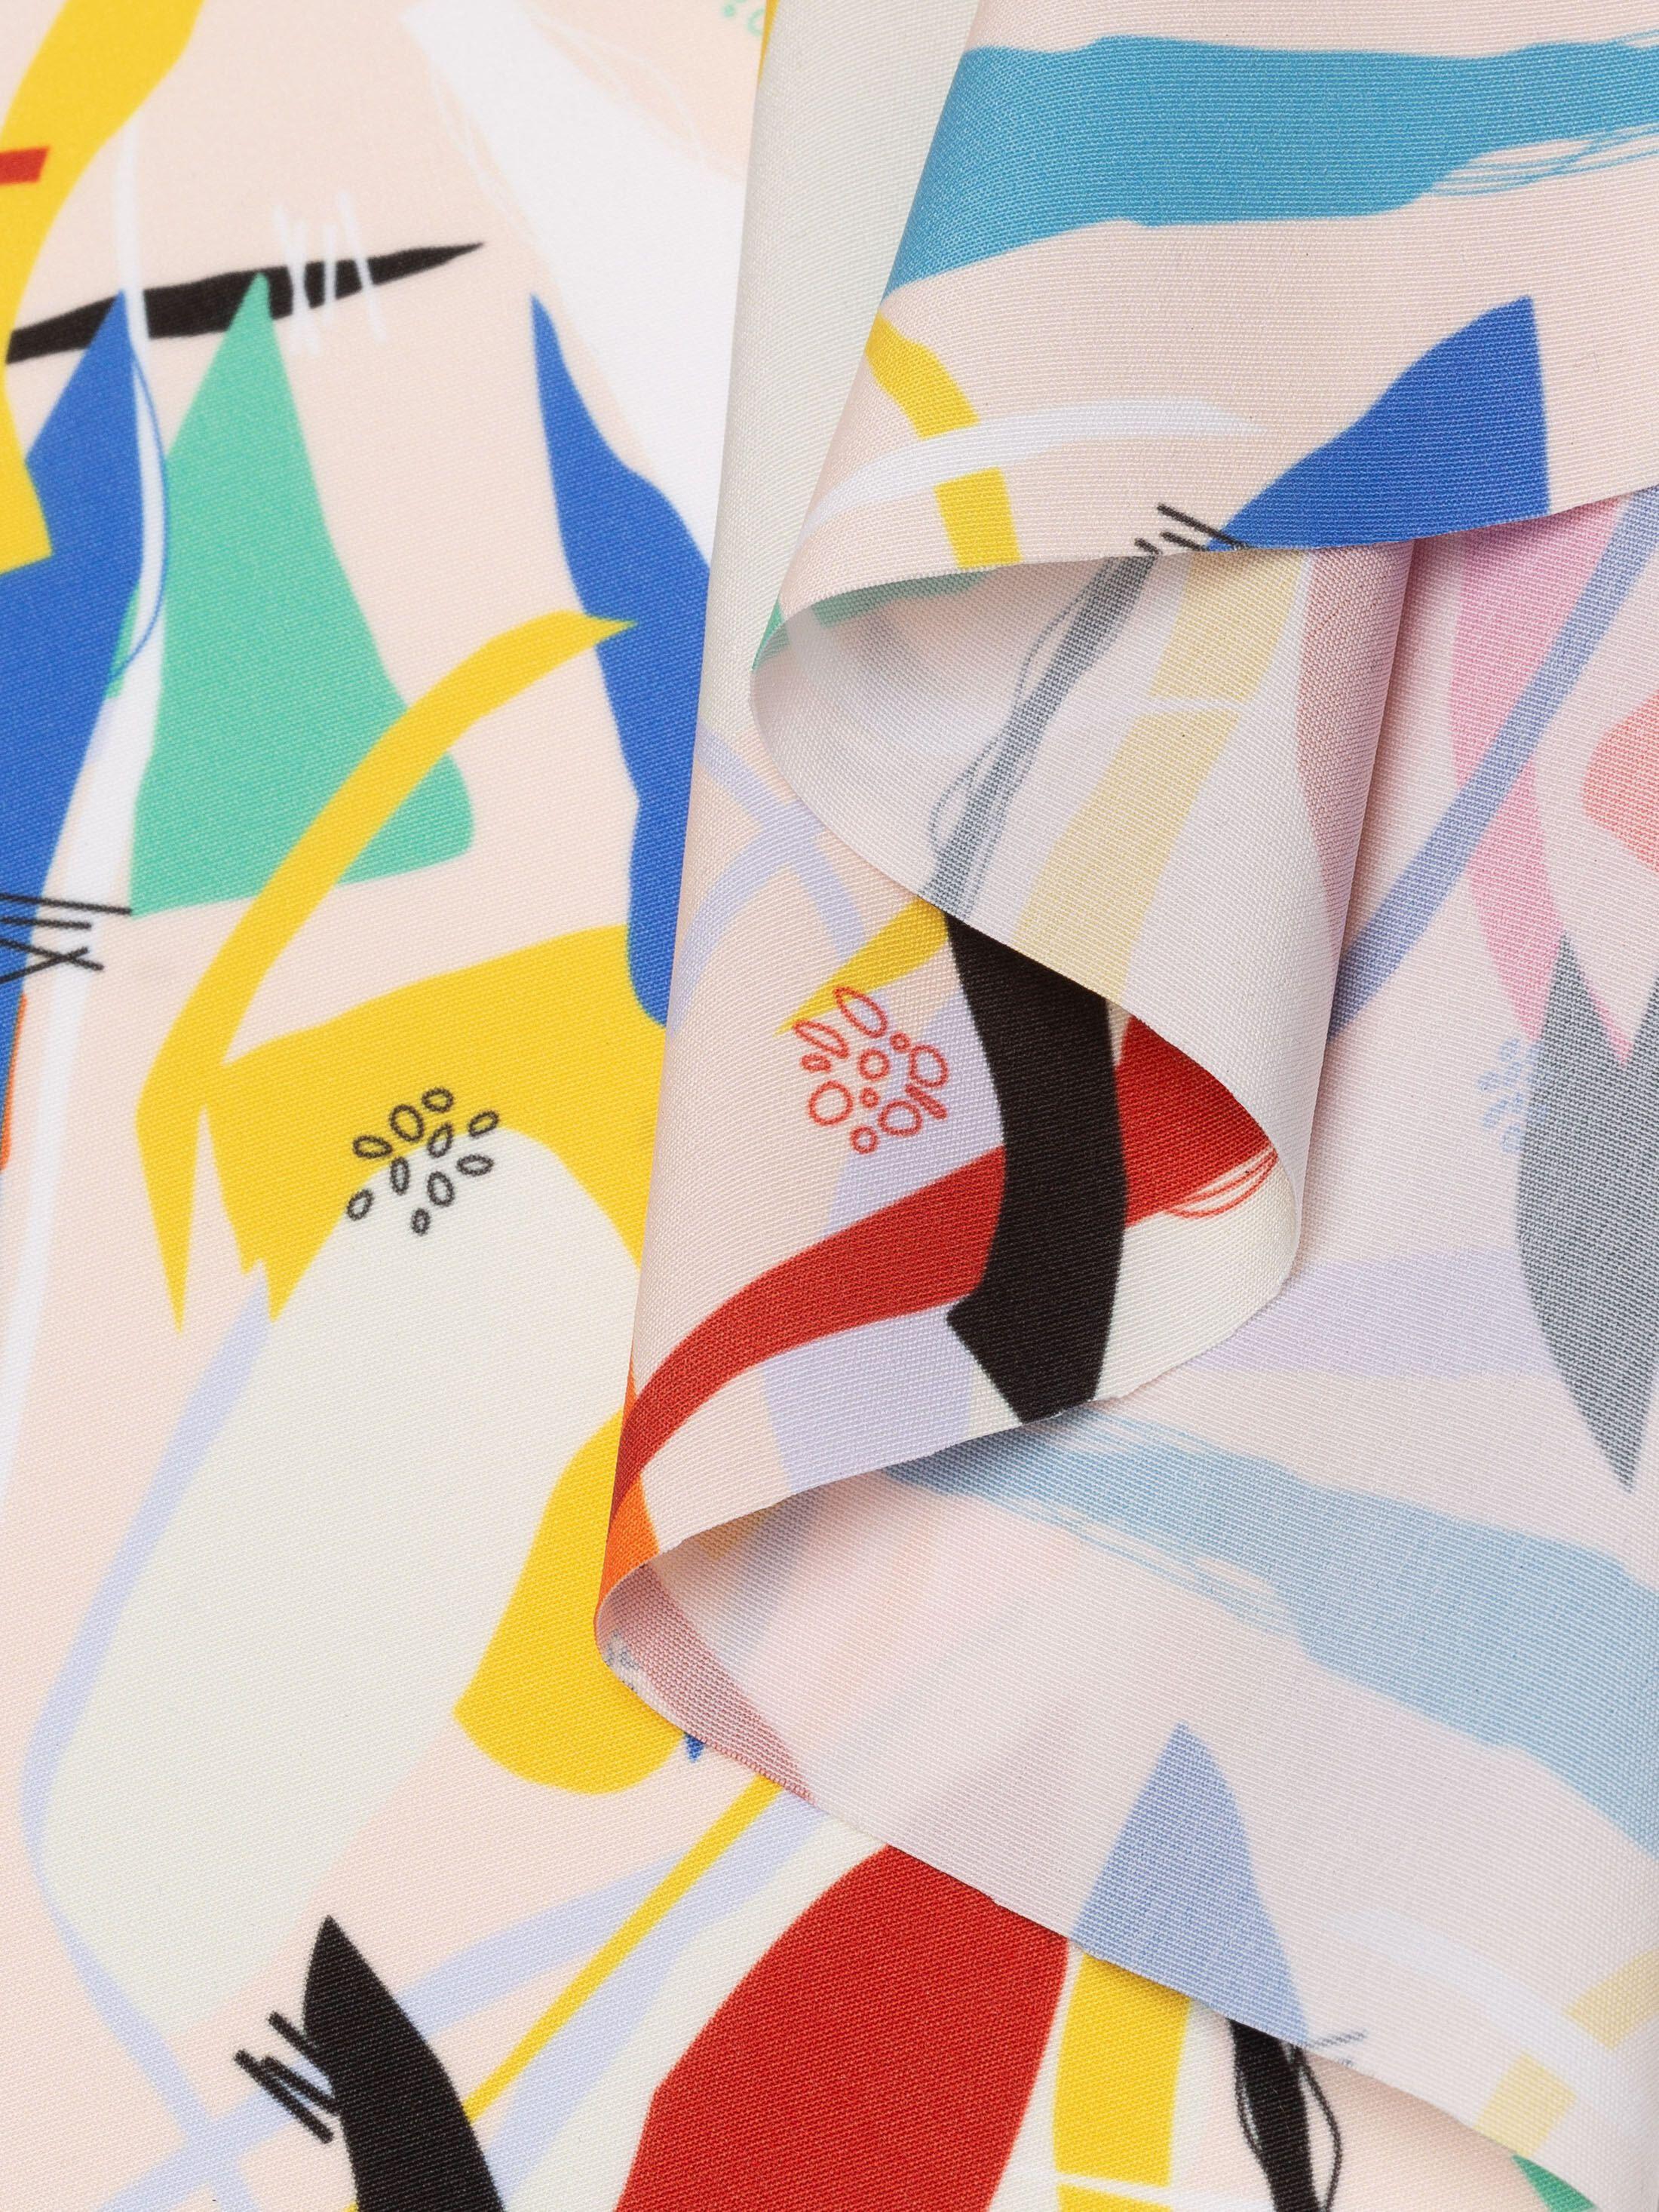 Poly digital print fabric